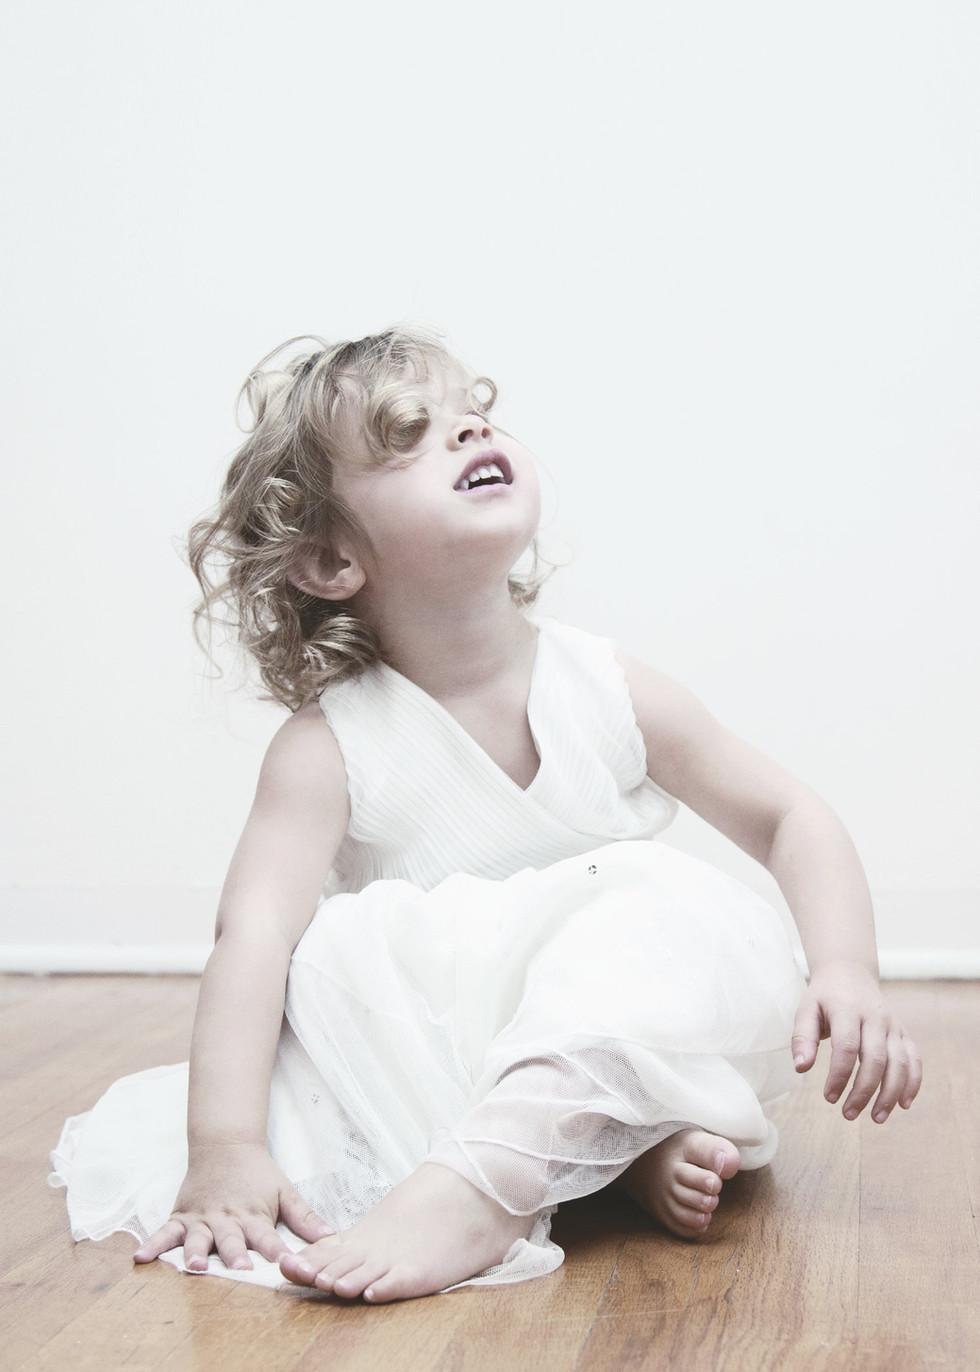 Fiona Stratton Photo Shoot-Fiona JPEGS-0004.jpg